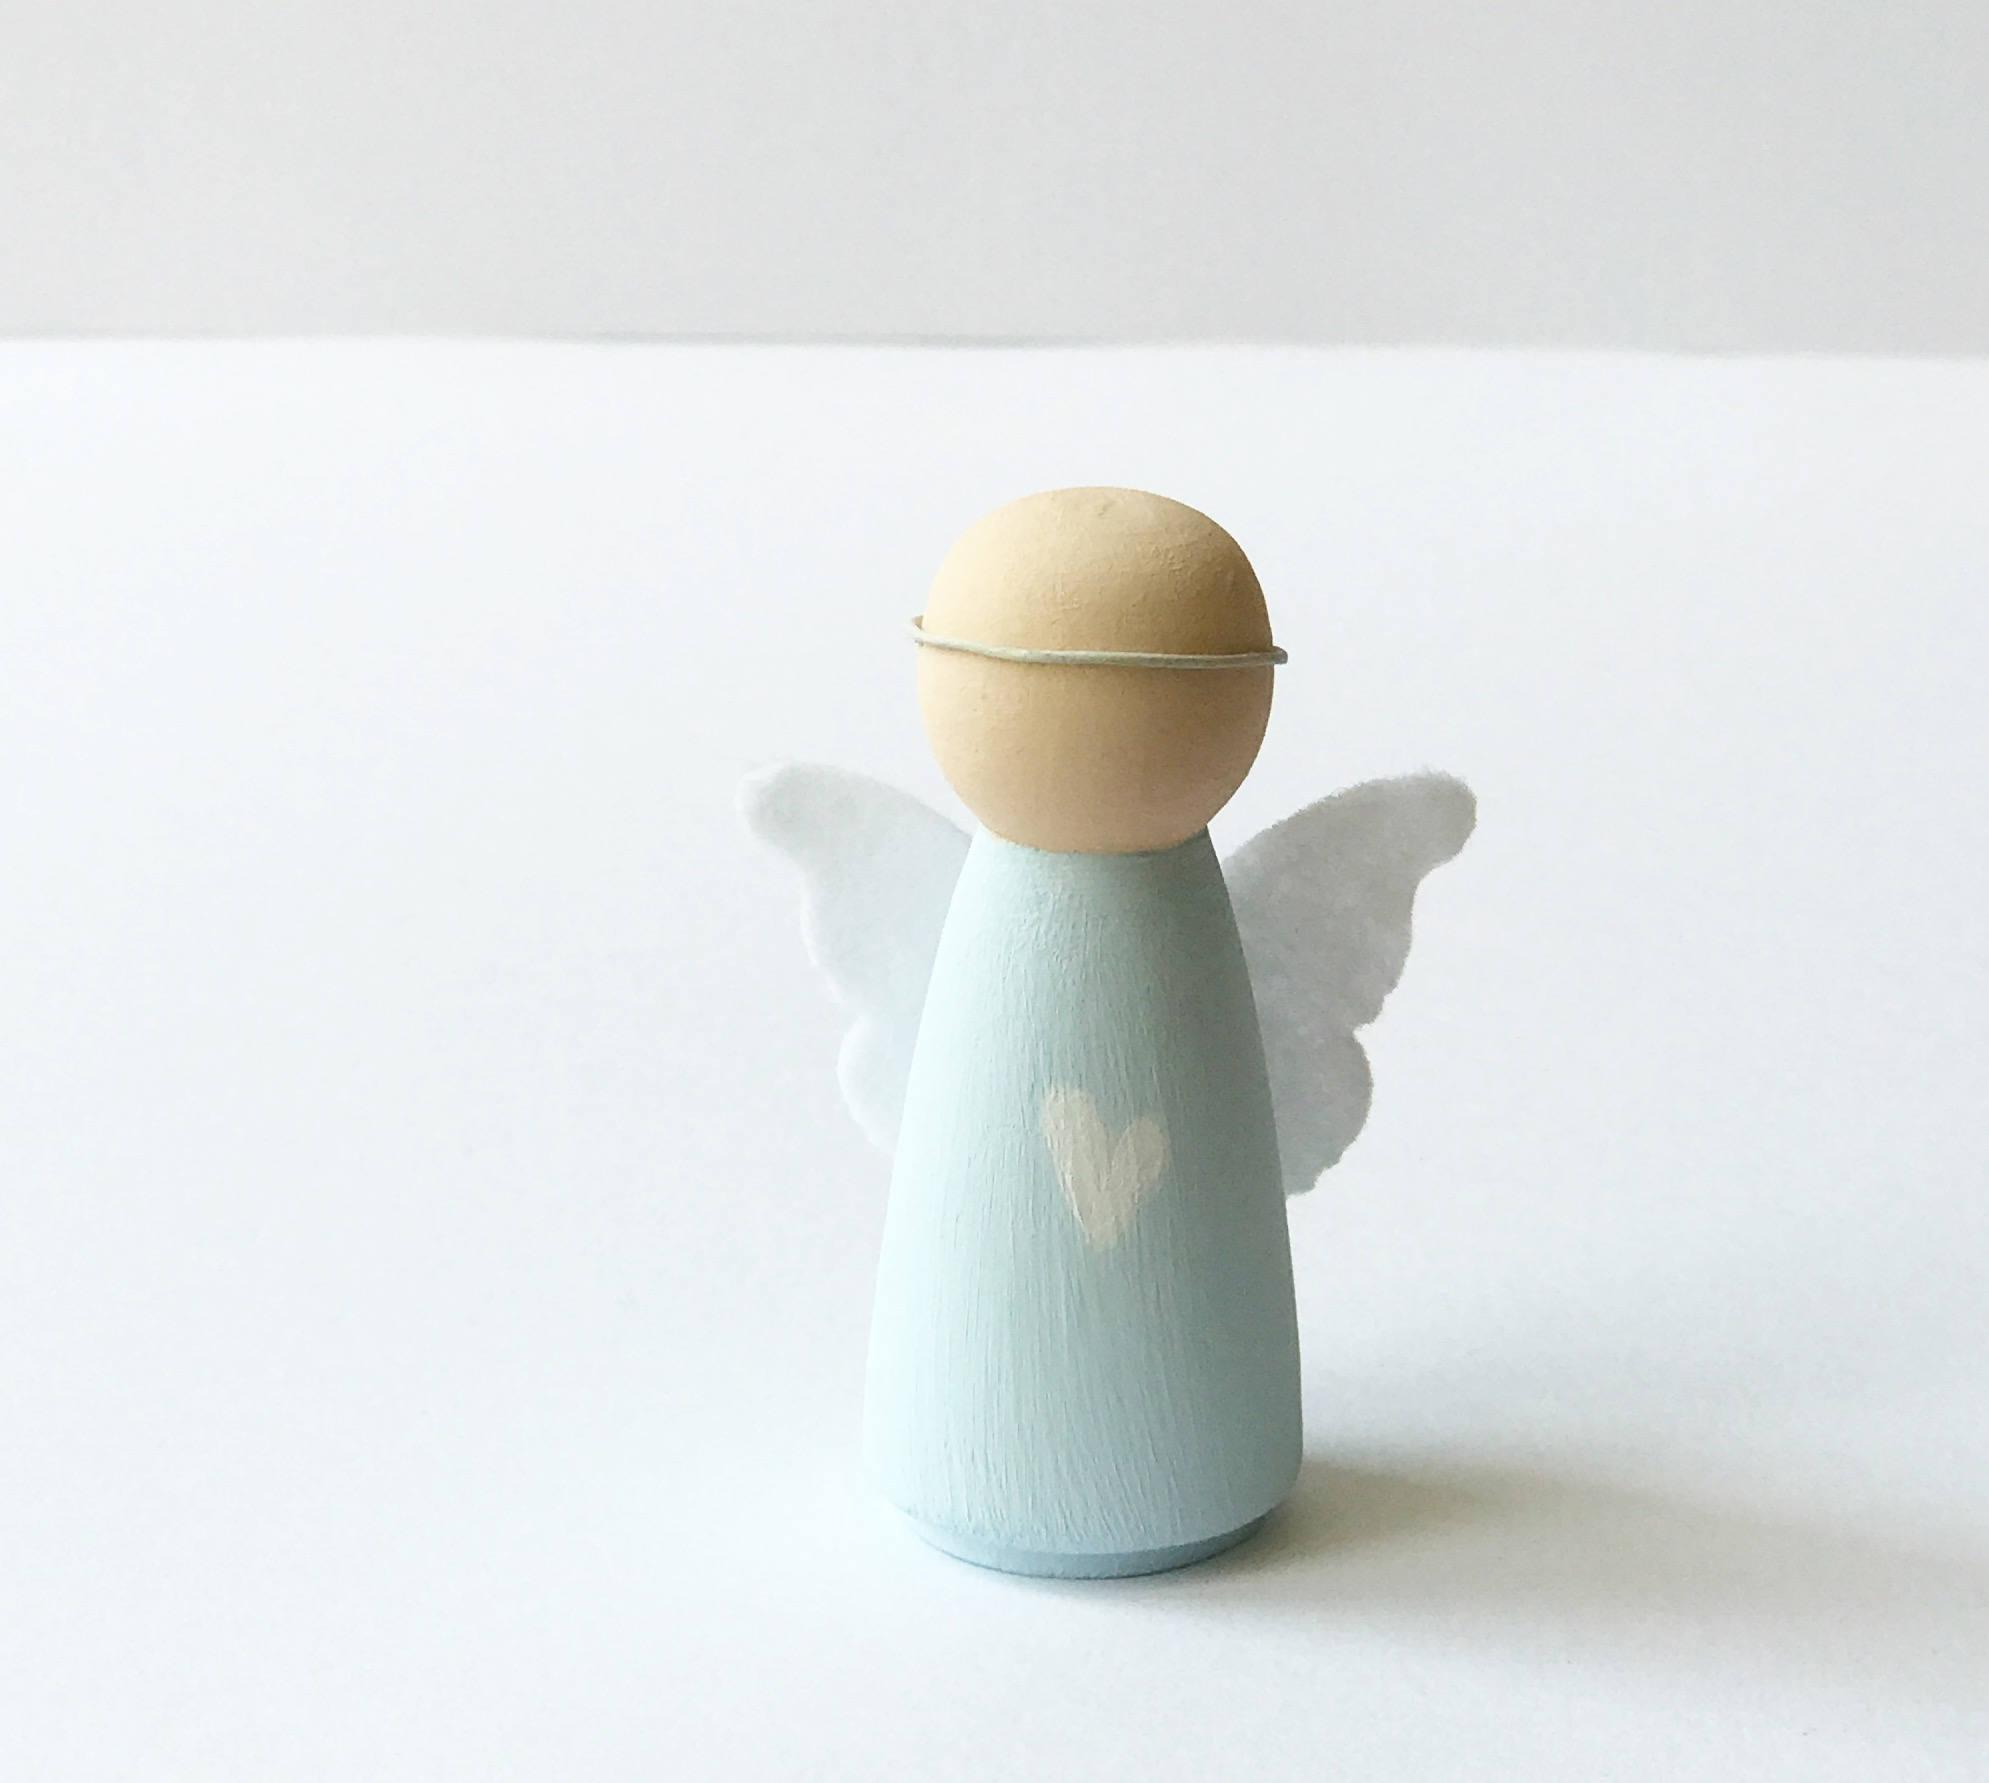 Boy Peg Doll Angel Peg Doll Angel Christening Gift New Baby Gift Nursery Decor Boys Nursery Decor Little Boys Room Nursery